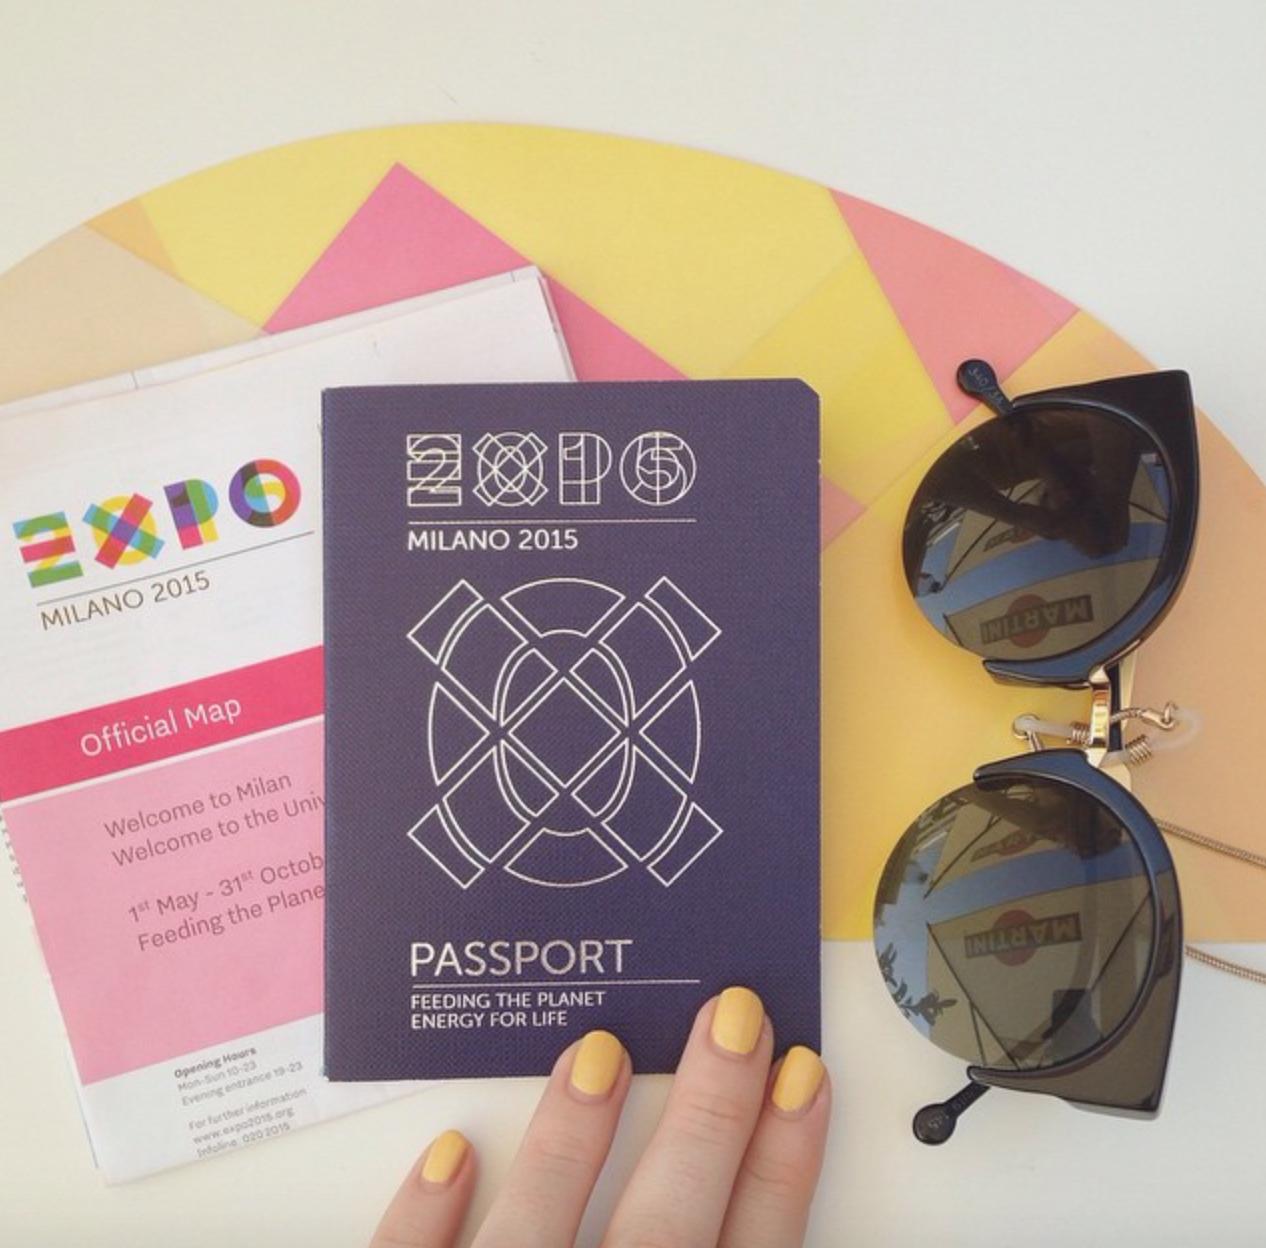 EXPO milano 2015 passport cover